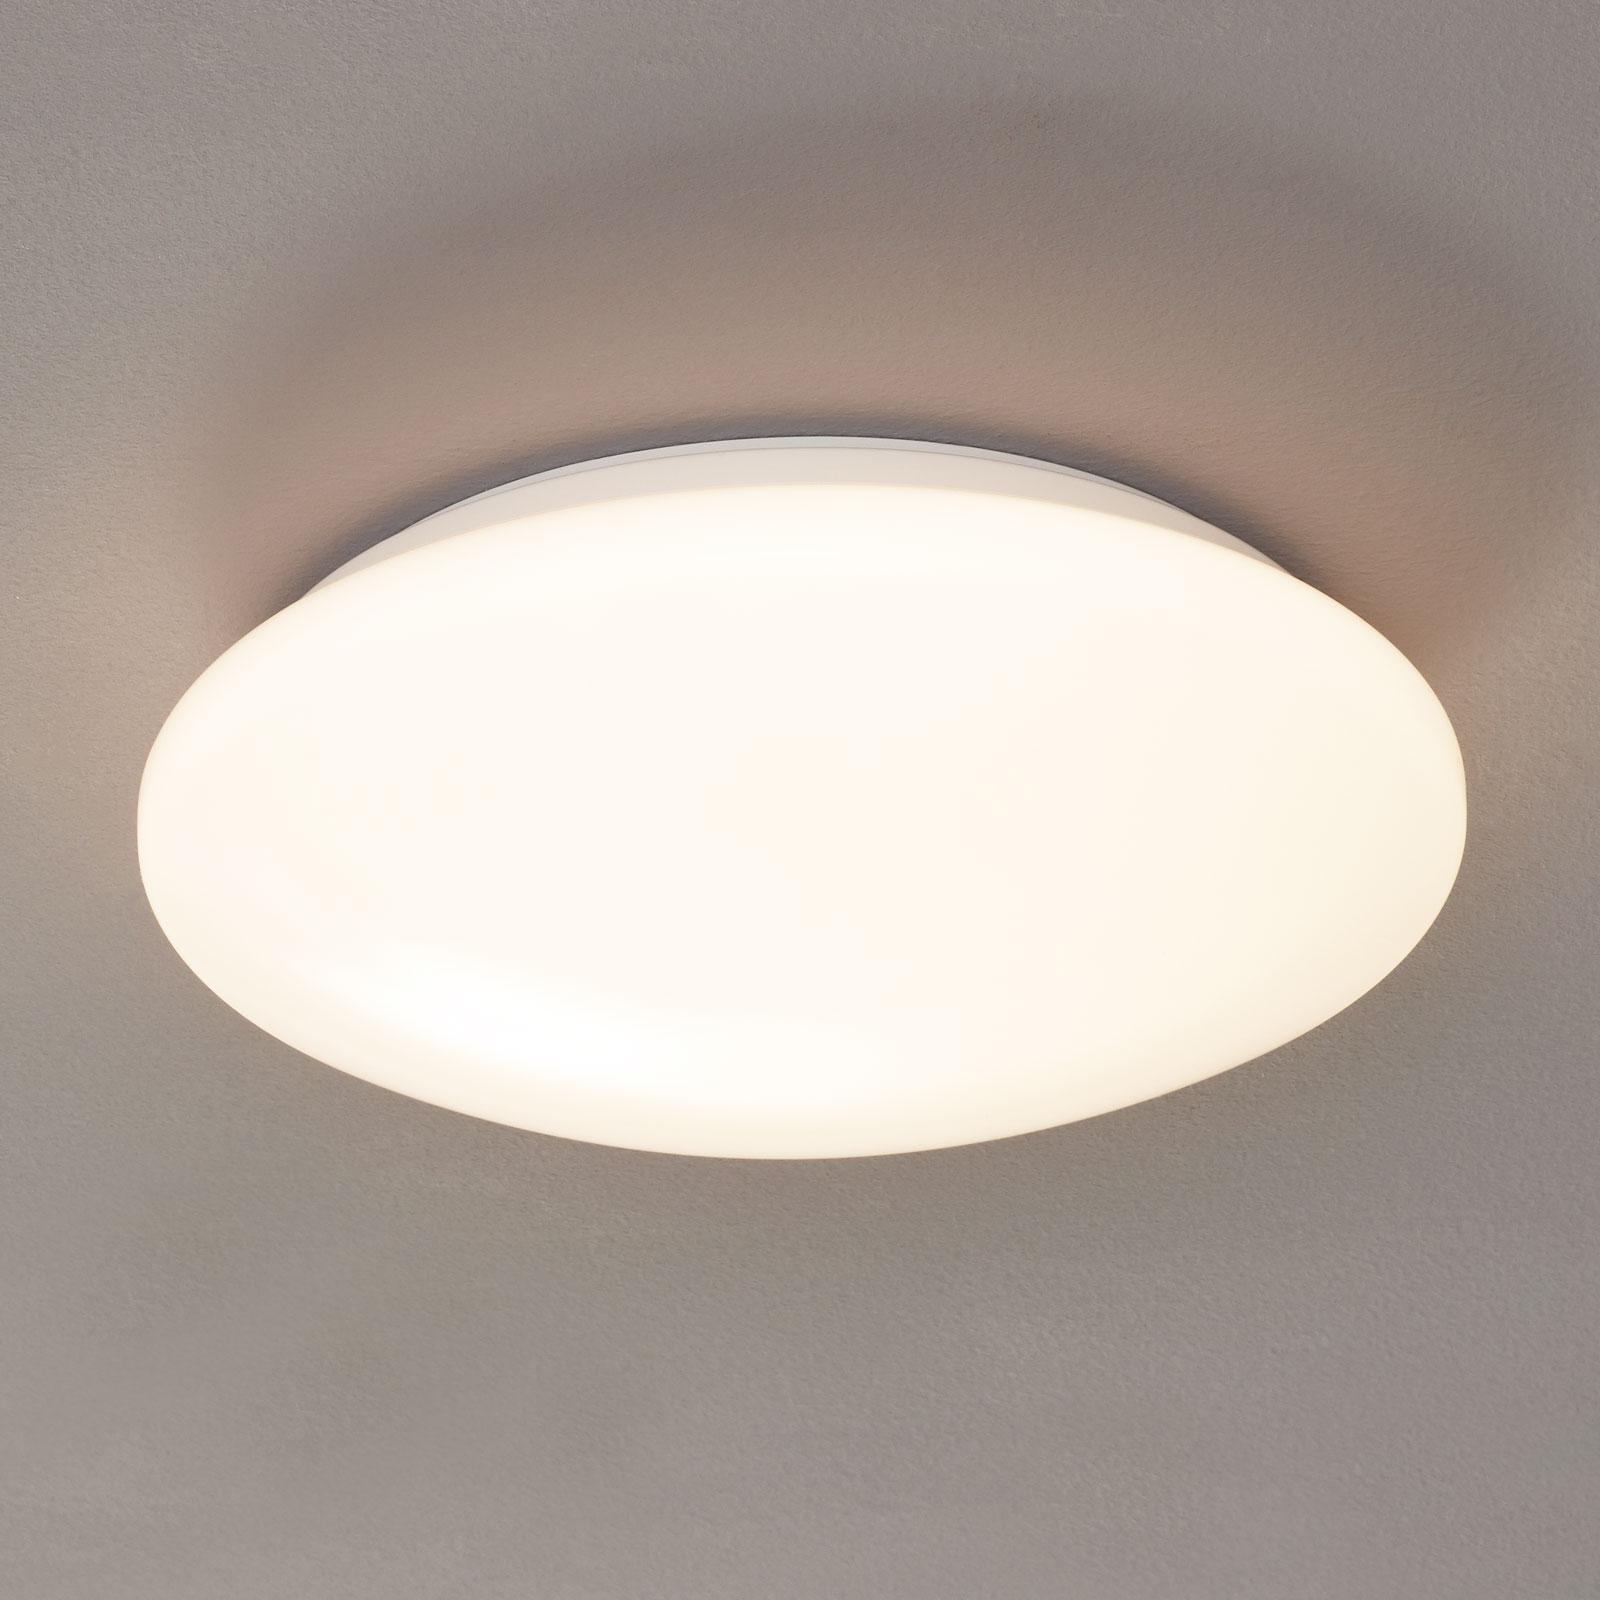 Lampa sufitowa LED Pollux, czujnik ruchu, Ø 27 cm